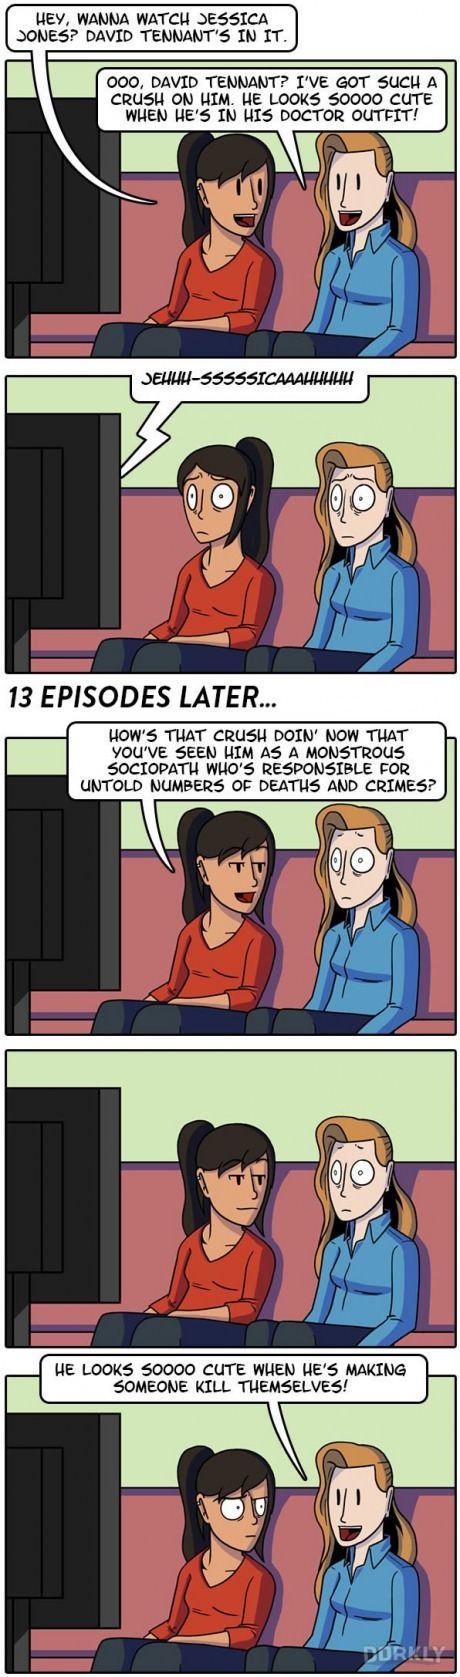 David Tennant Fans vs. Jessica Jones